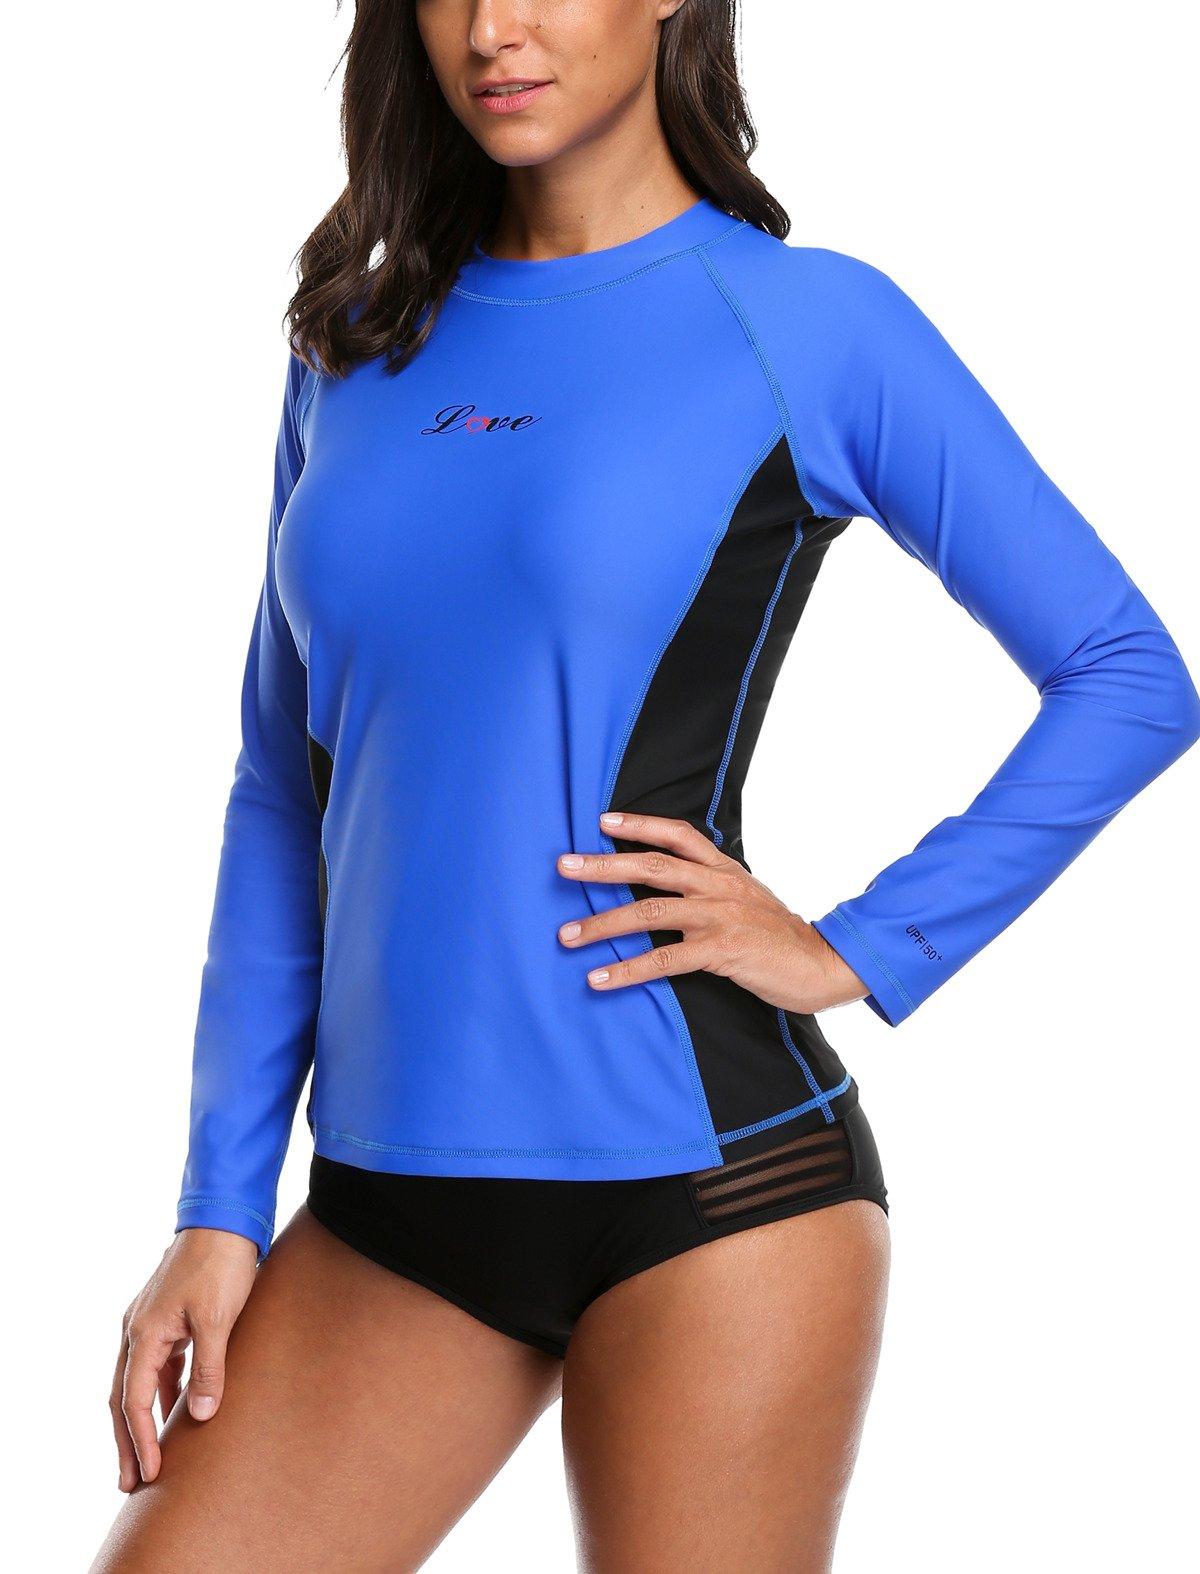 ALove Surf Shirt Rash Guard UPF 50 Athletic Top Womens Surf Rashguard Long Sleeve Medium by ALove (Image #2)